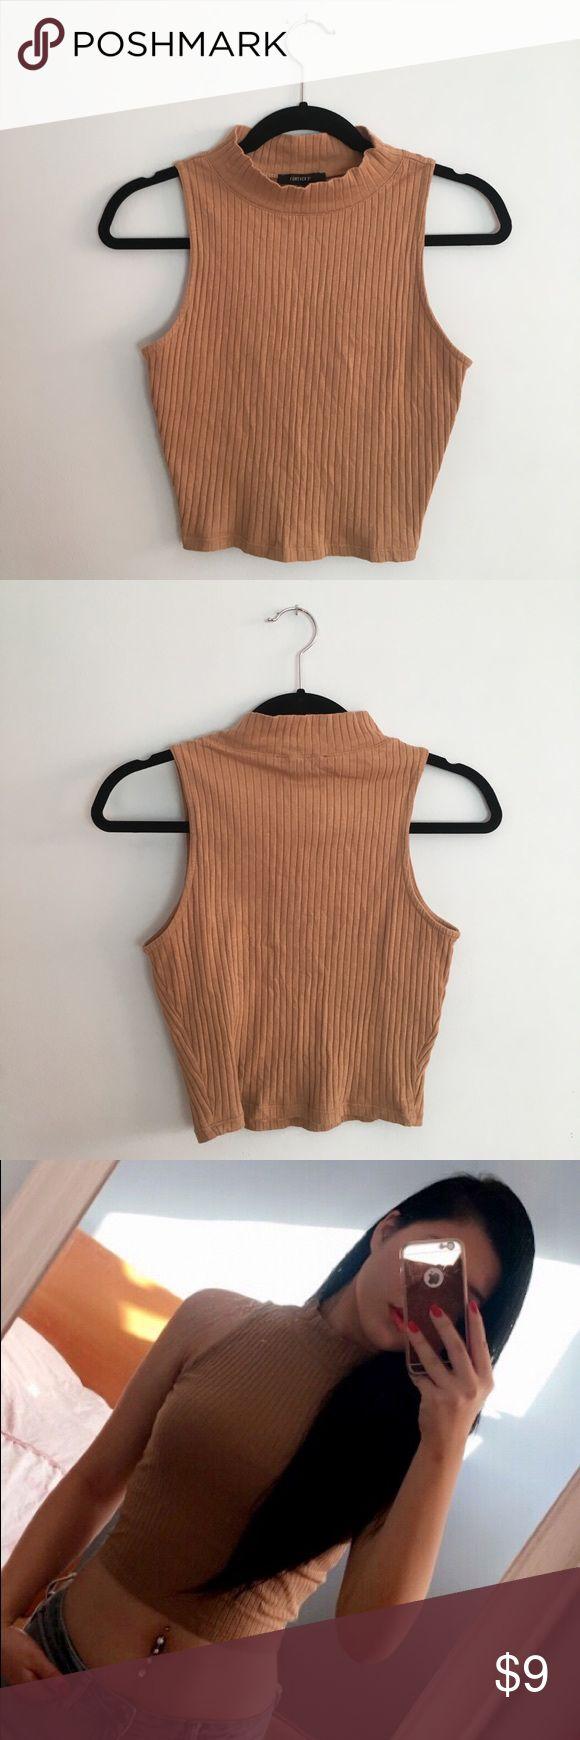 camel cropped mock neck shirt ribbed crop top Forever 21 Tops Crop Tops